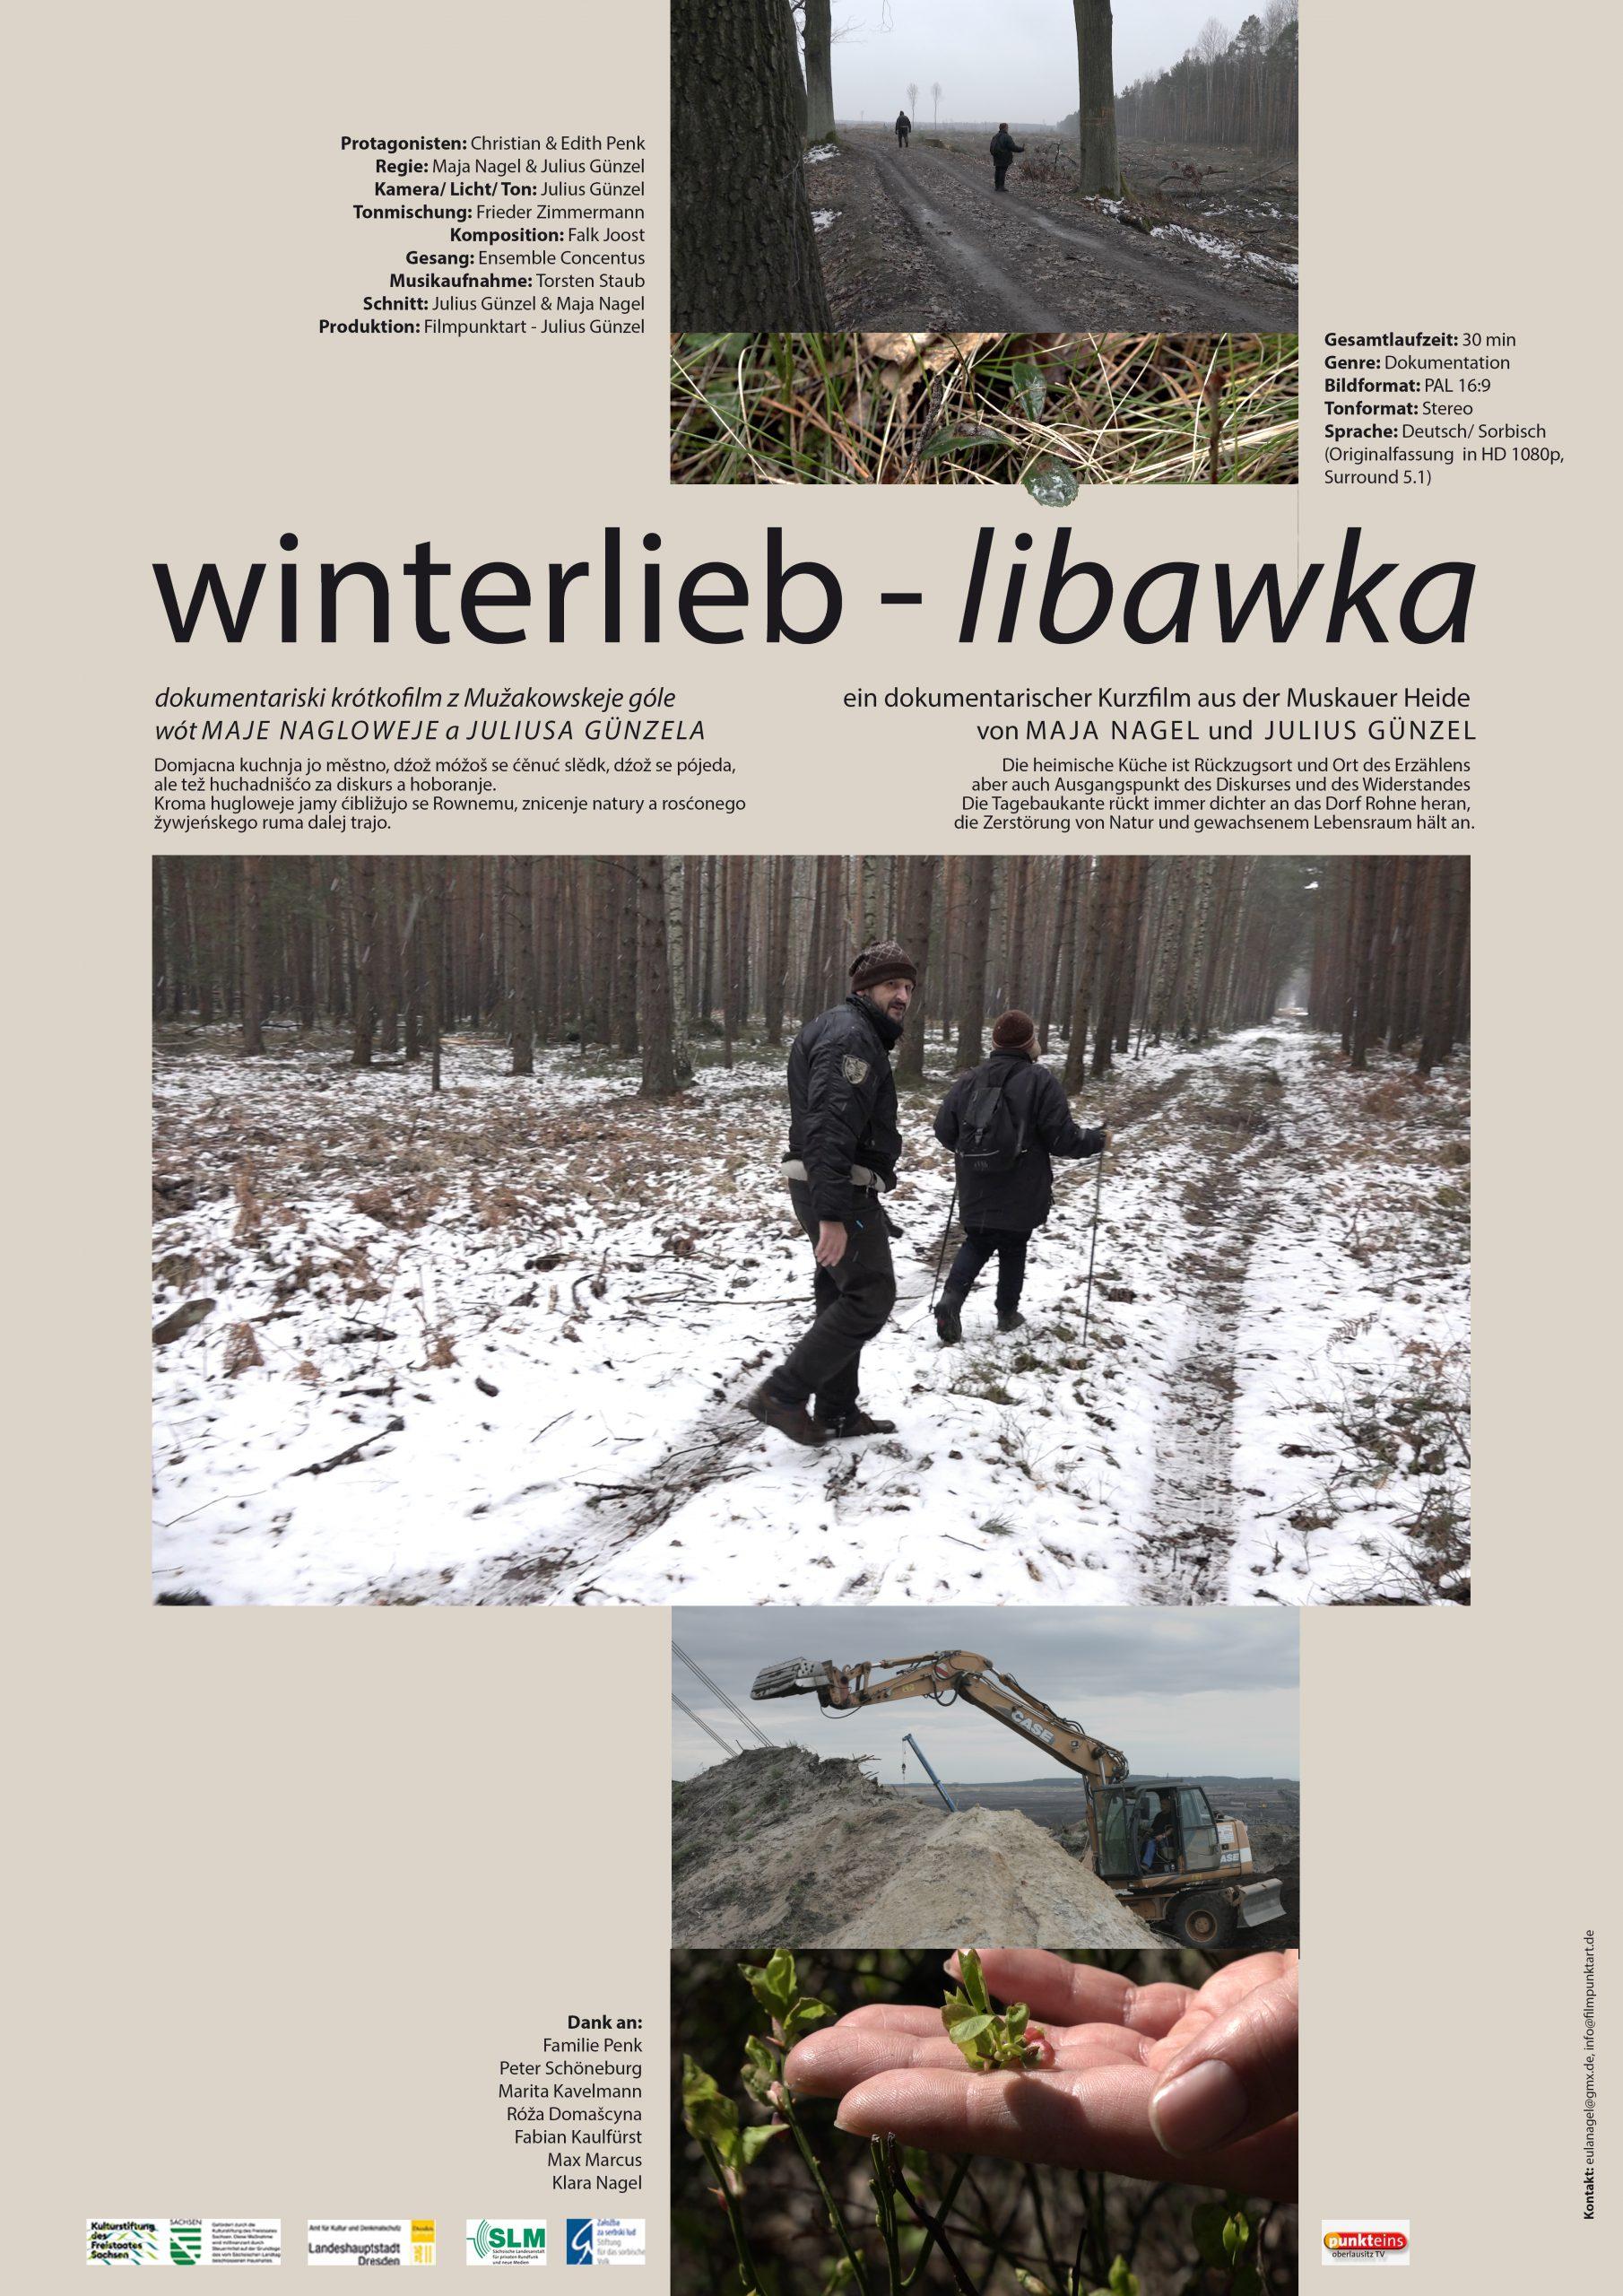 winterlieb – libawka